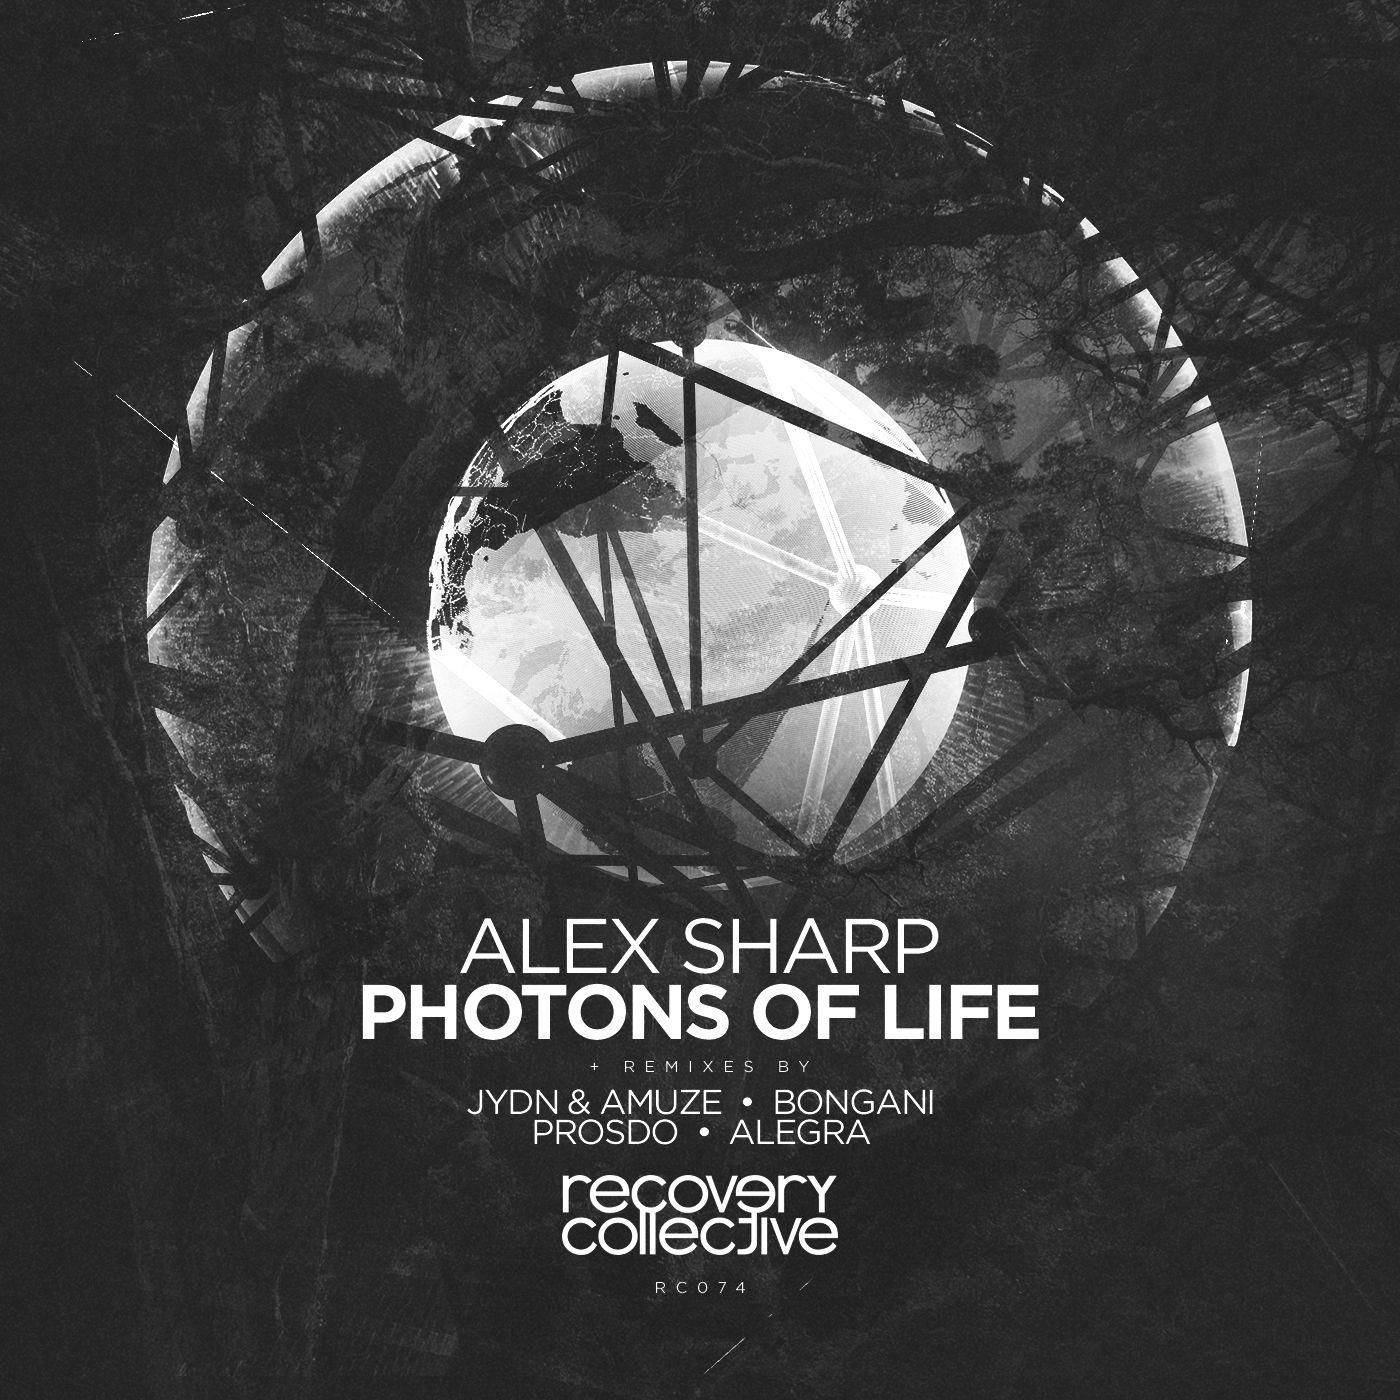 alex_sharp_-_photons_of_life_track_art.jpg